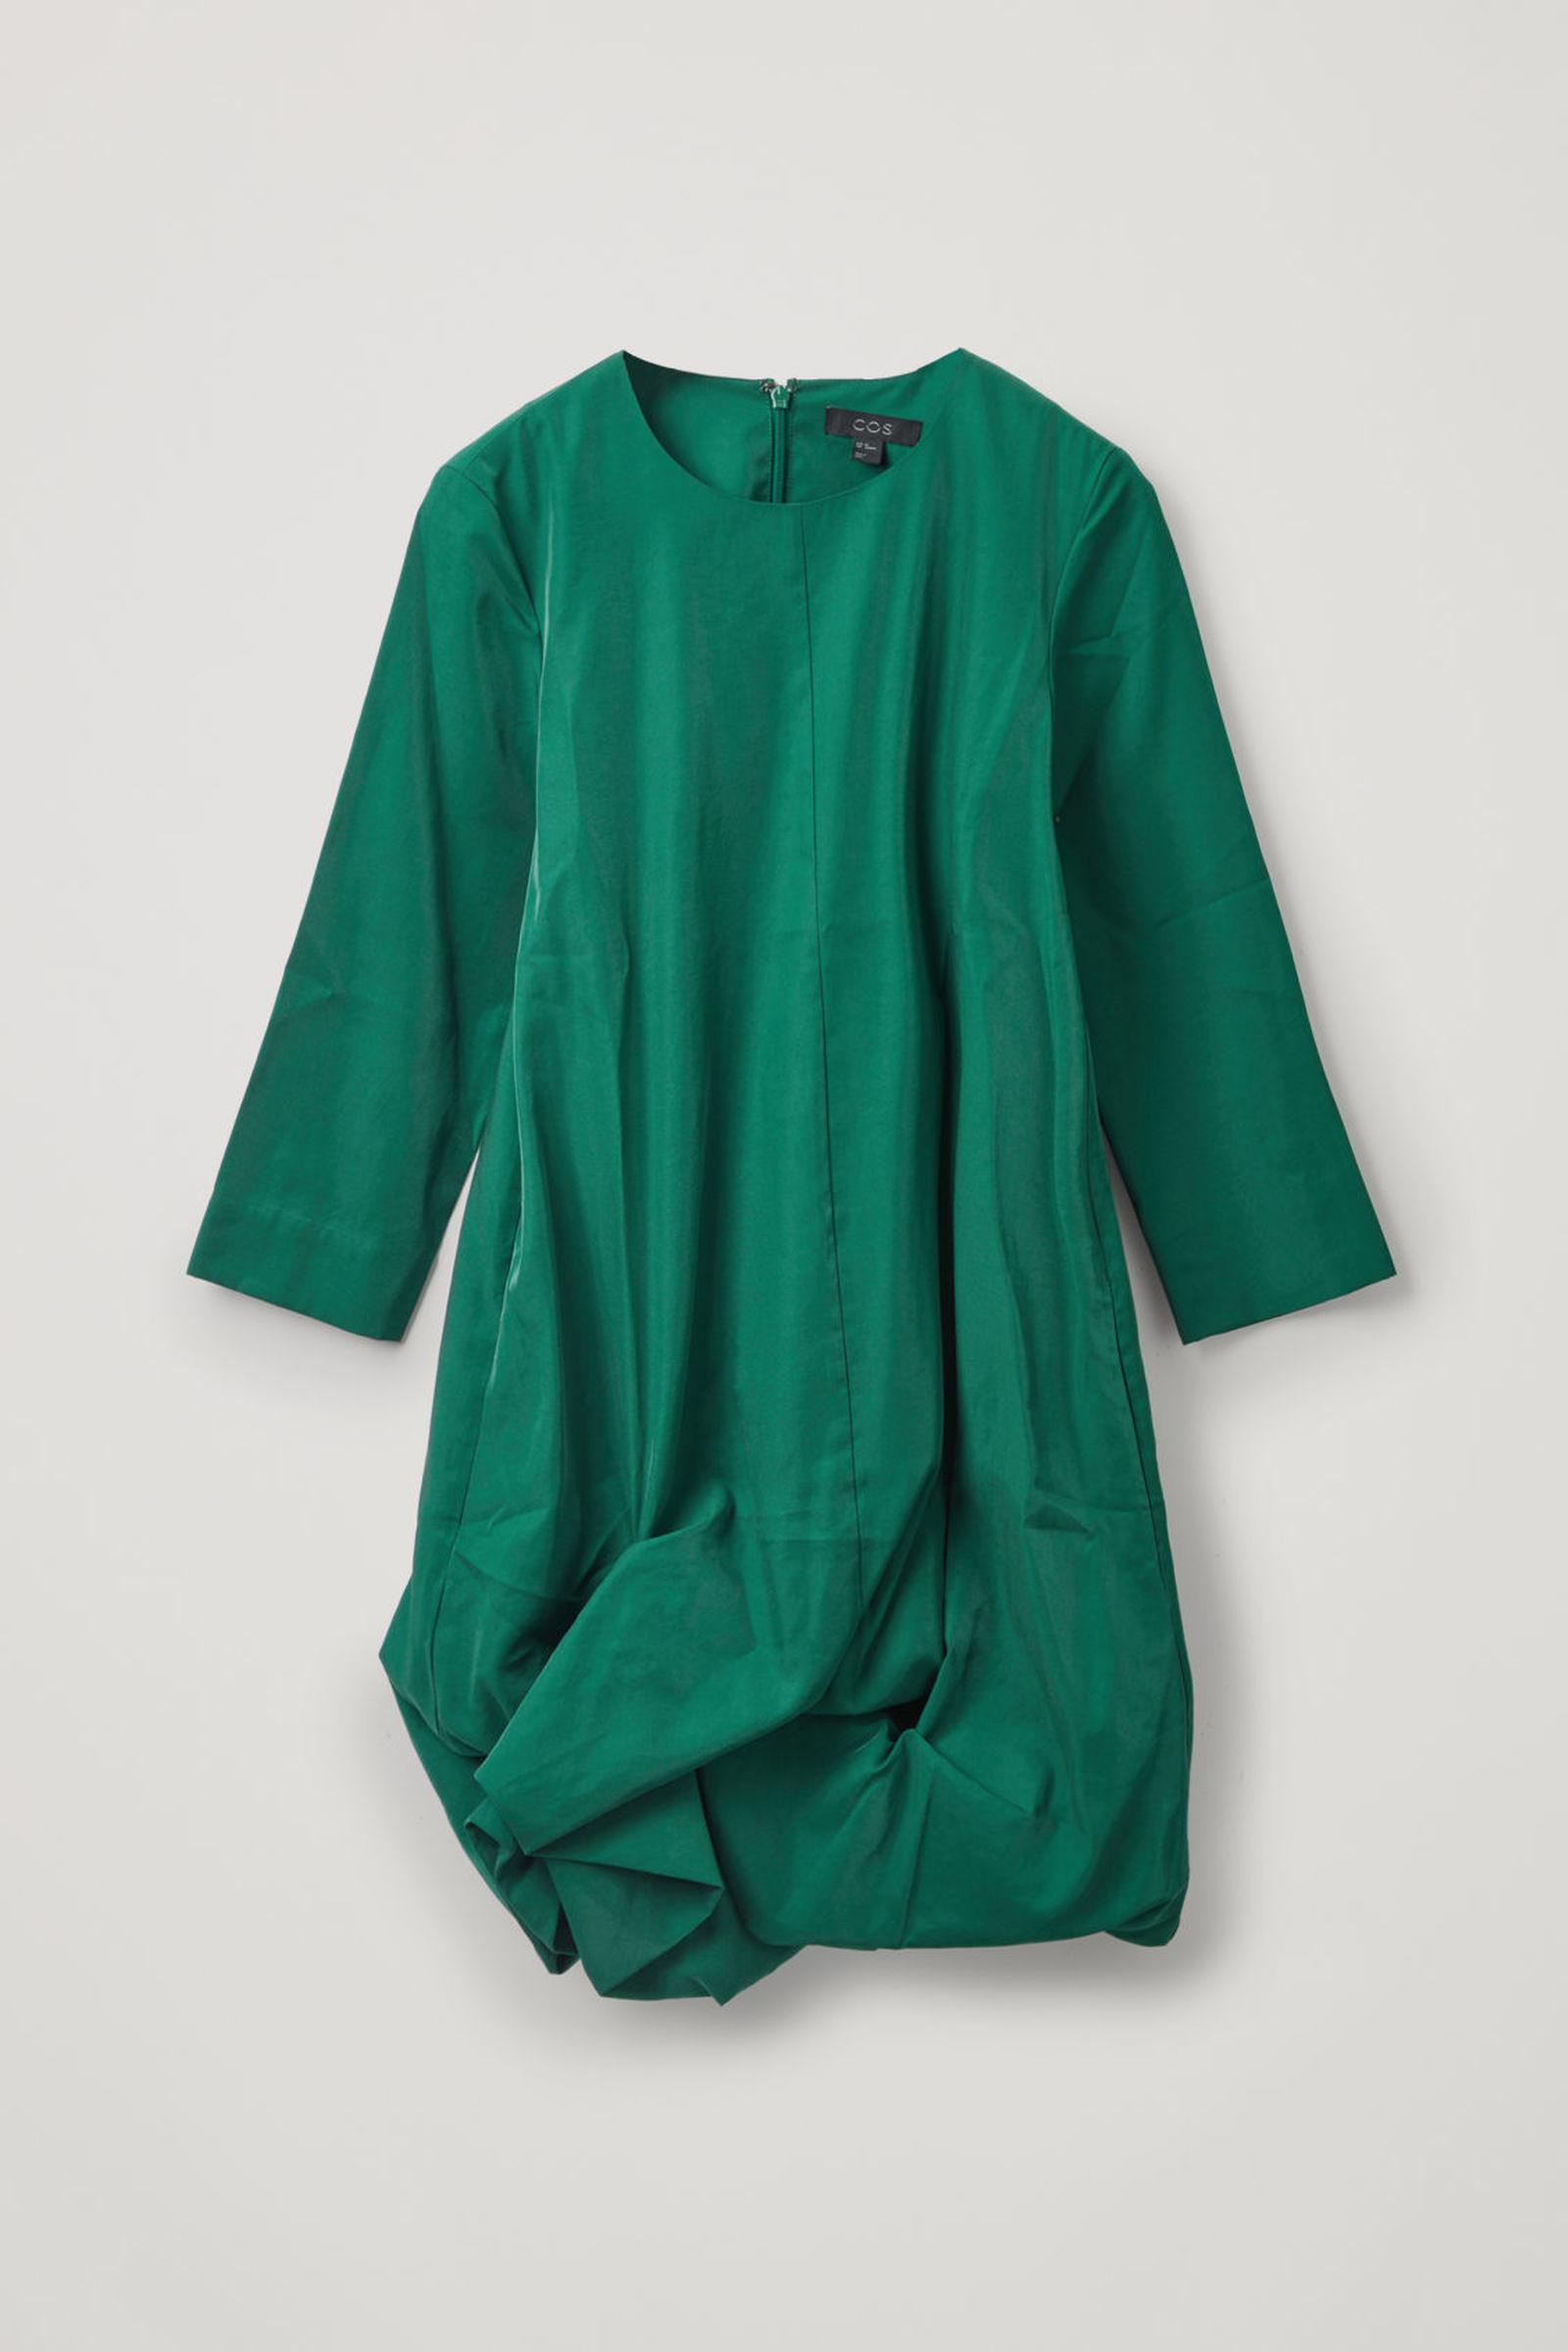 COS 롱 슬리브 개더드 헴 드레스의 그린컬러 Product입니다.